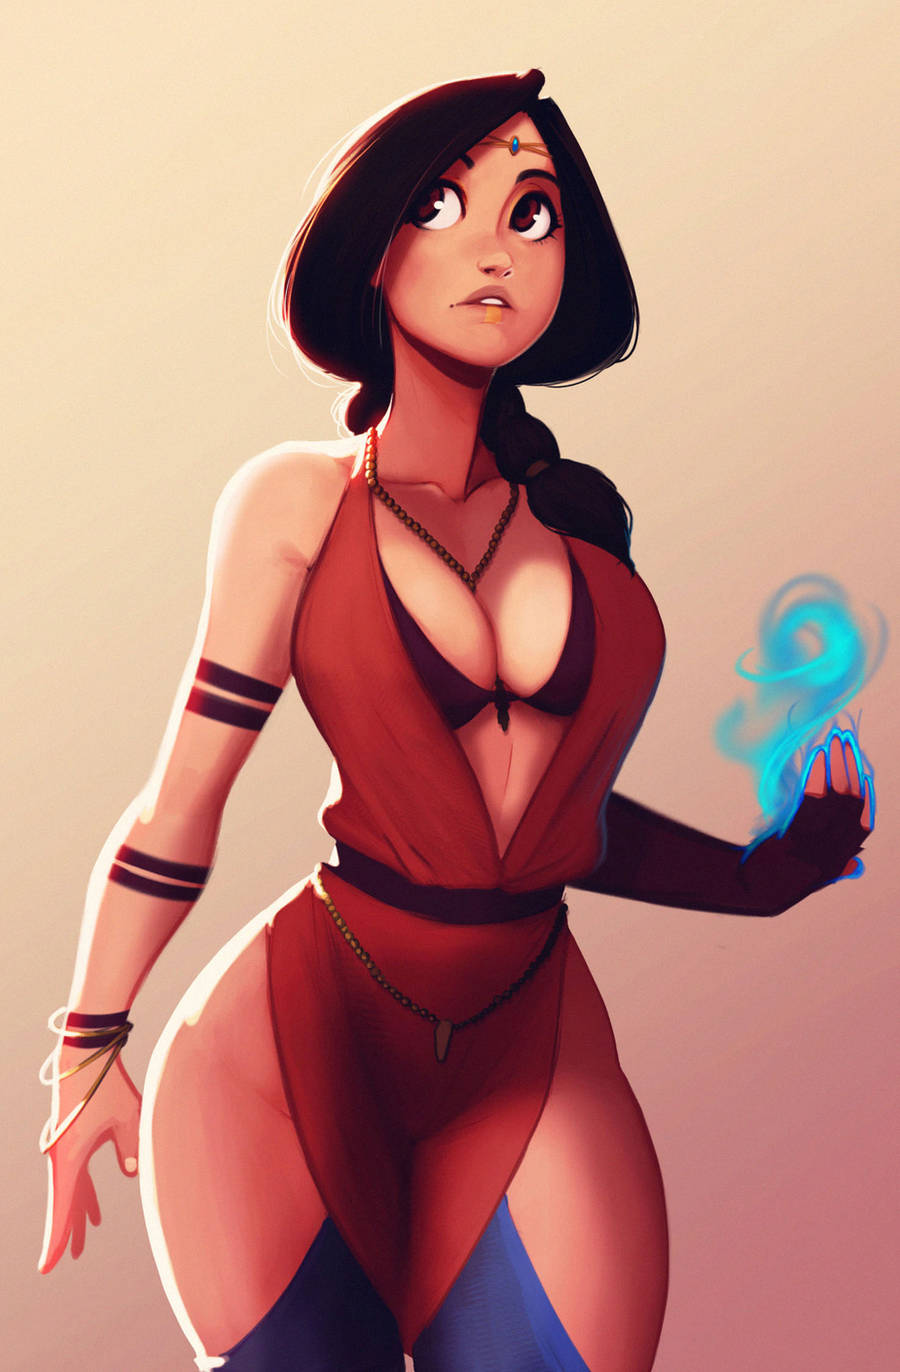 Sorceress by Raichiyo33